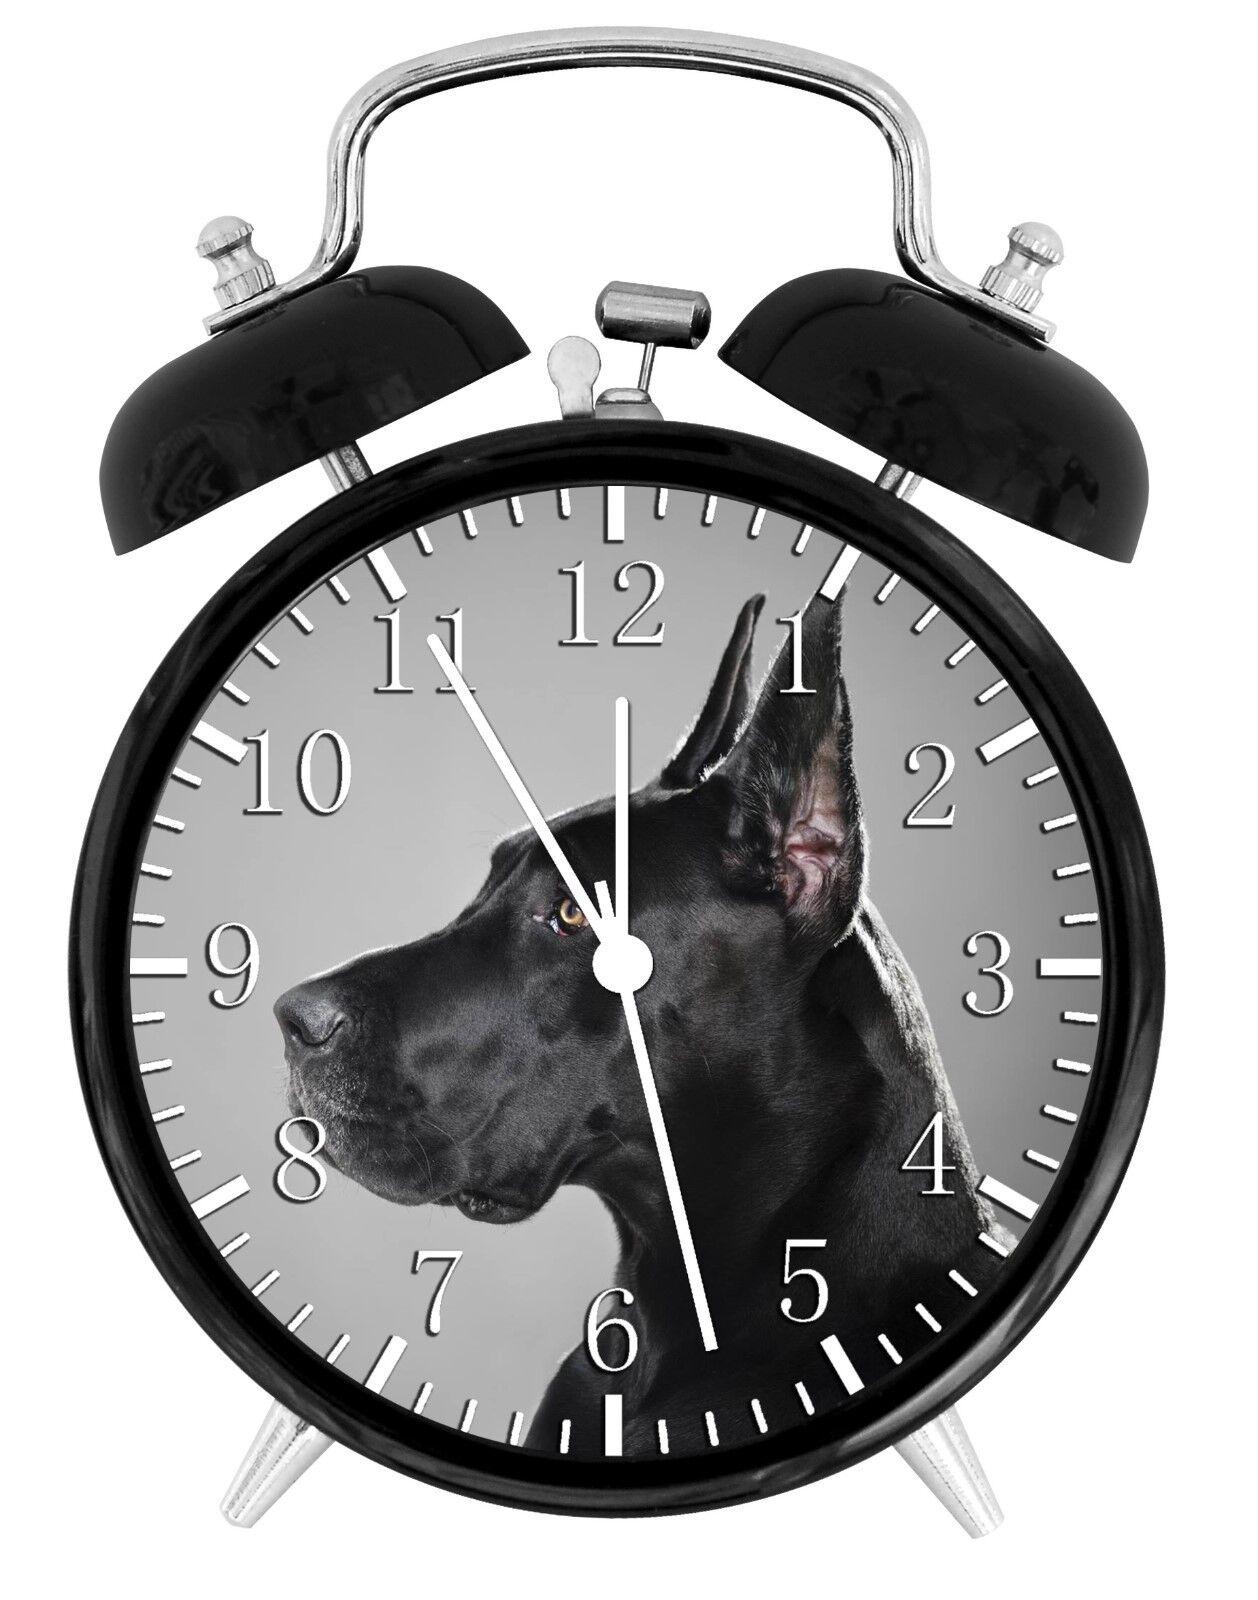 Great Dane Alarm Desk Clock Home or Office Decor F90 Nice Gift